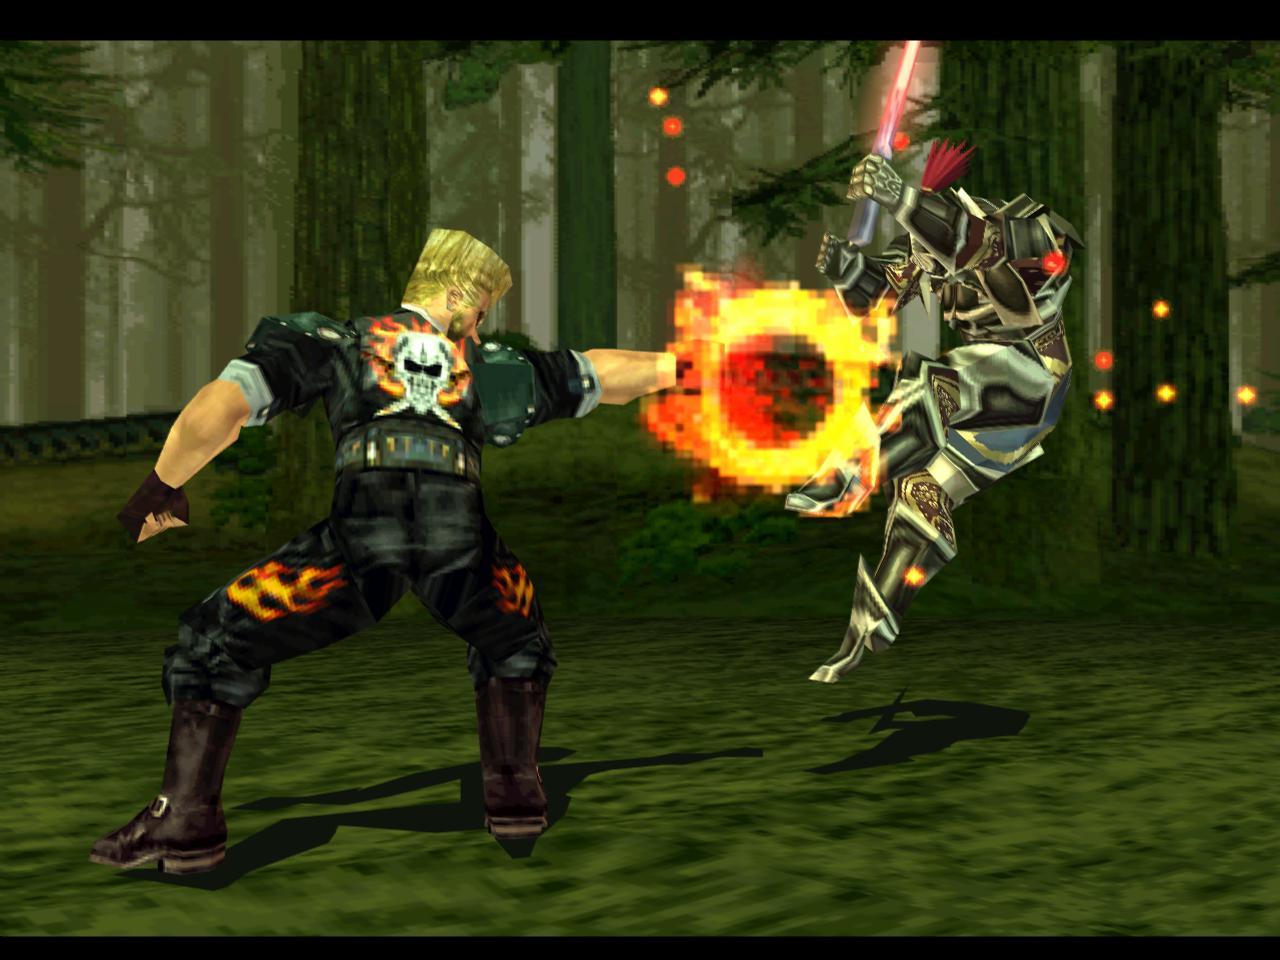 Tekken 3 Game Play